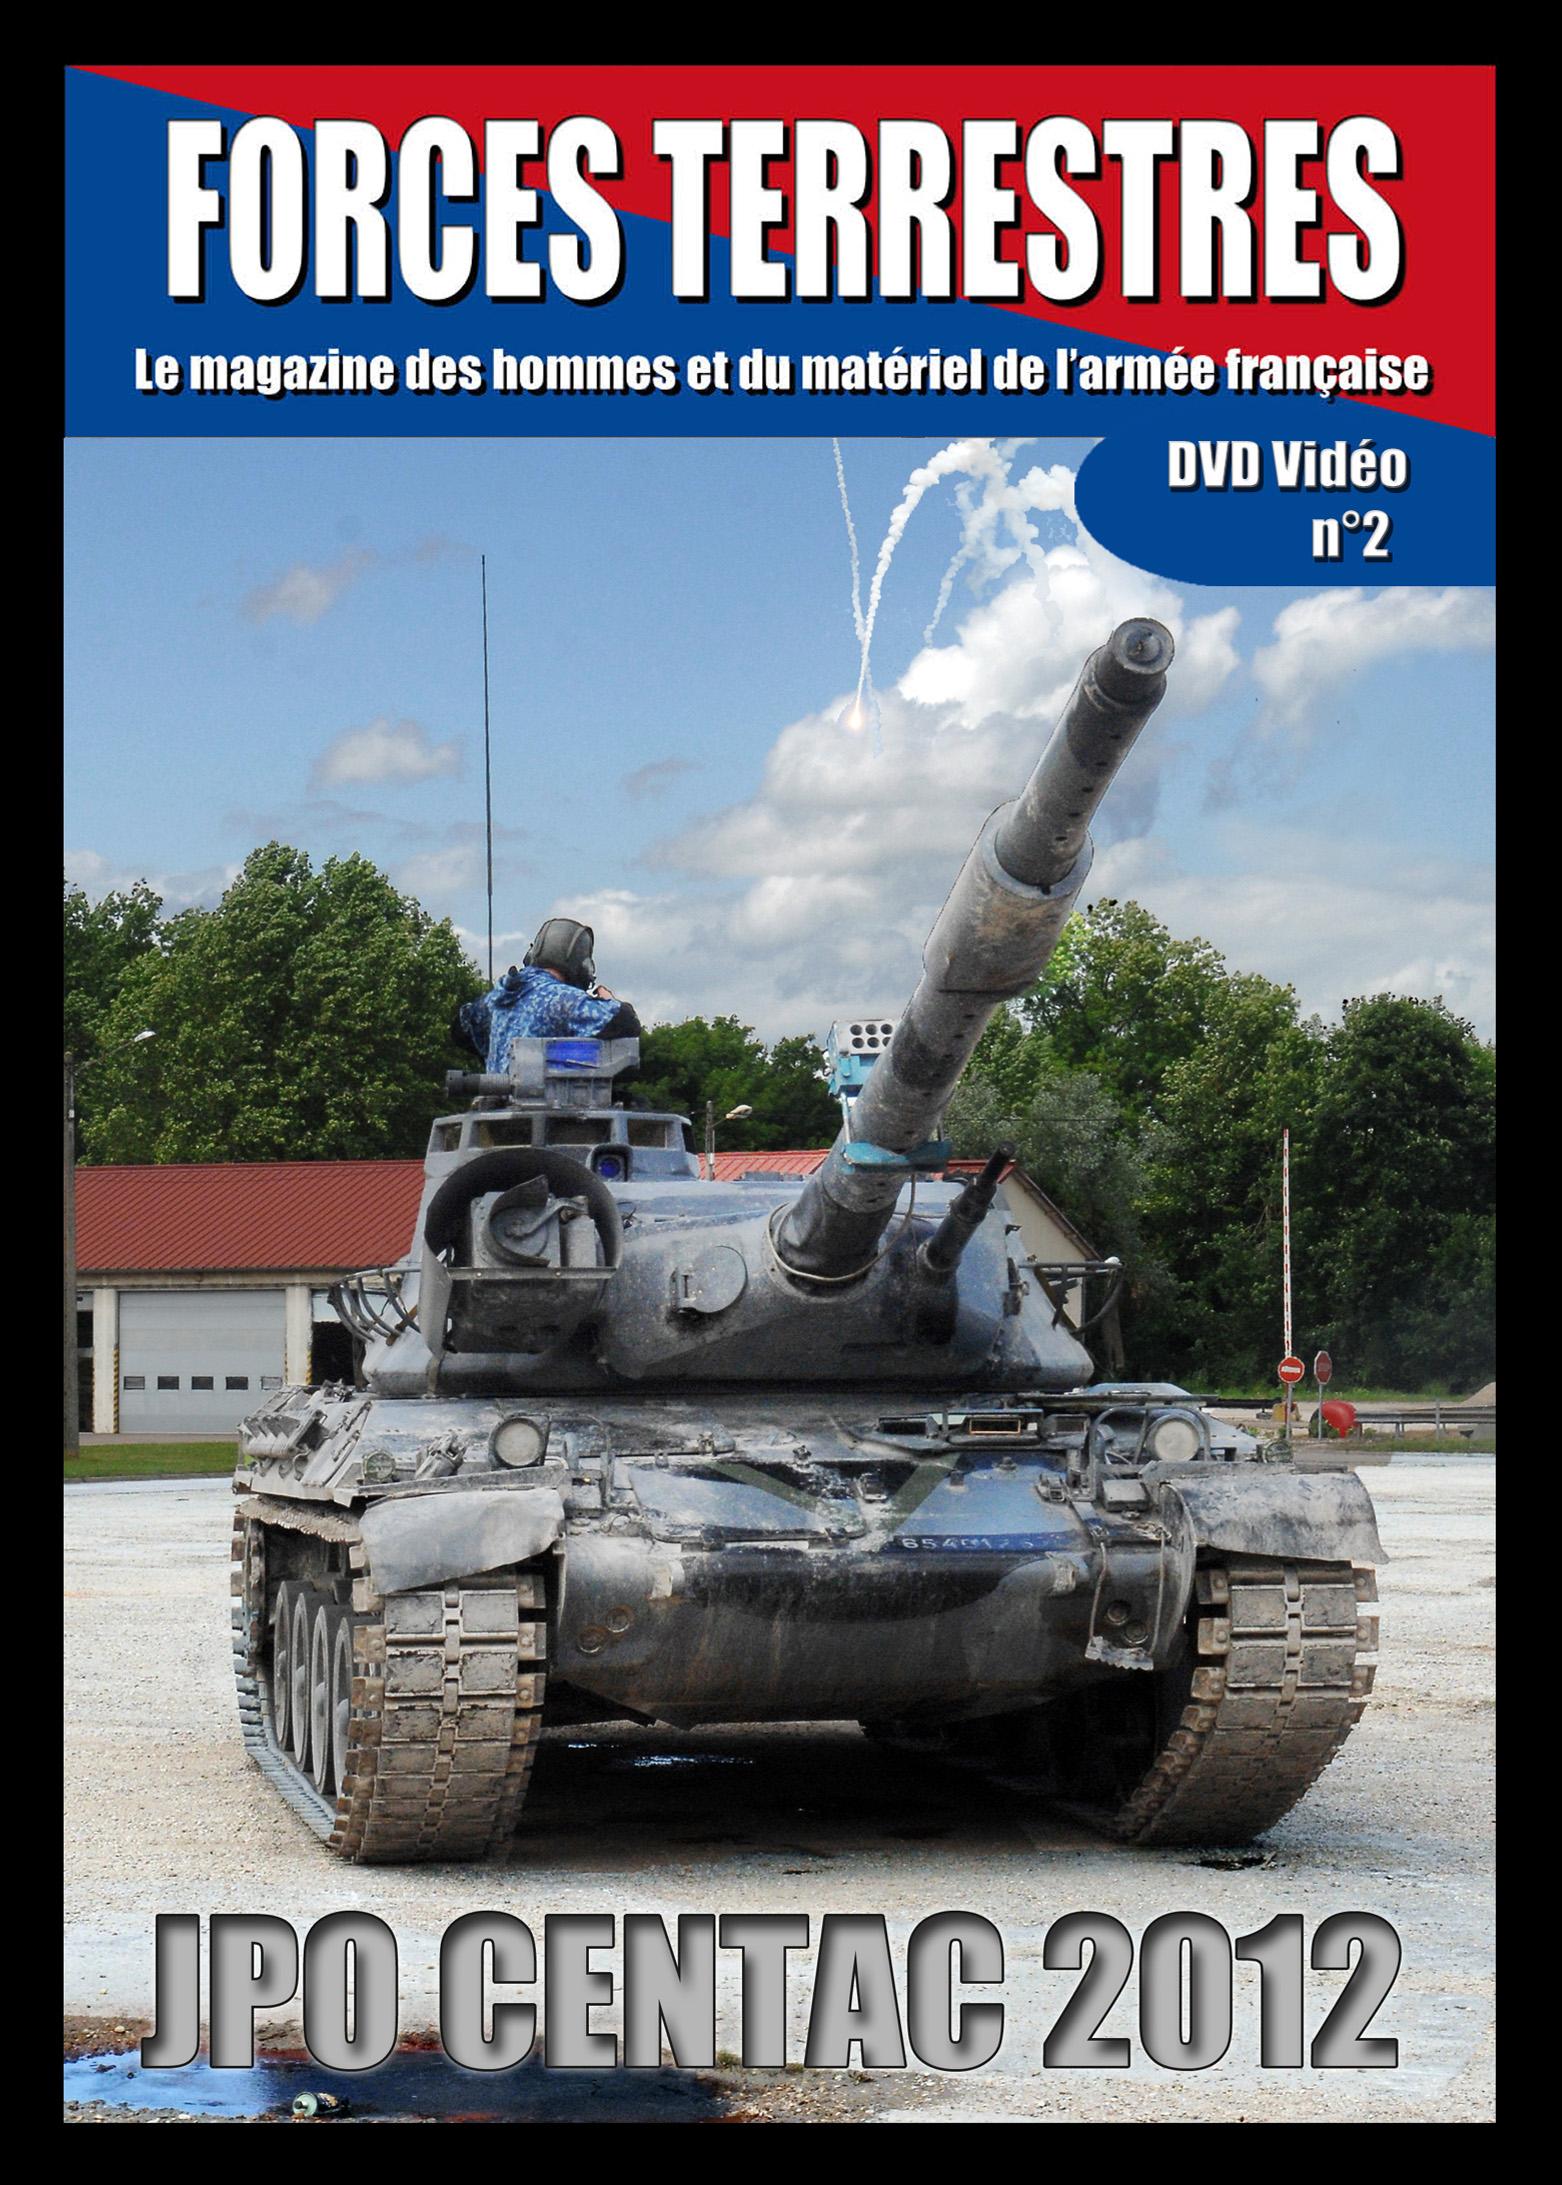 DVD Vidéos N°2 Journées Portes Ouvertes CENTAC Mailly 2012